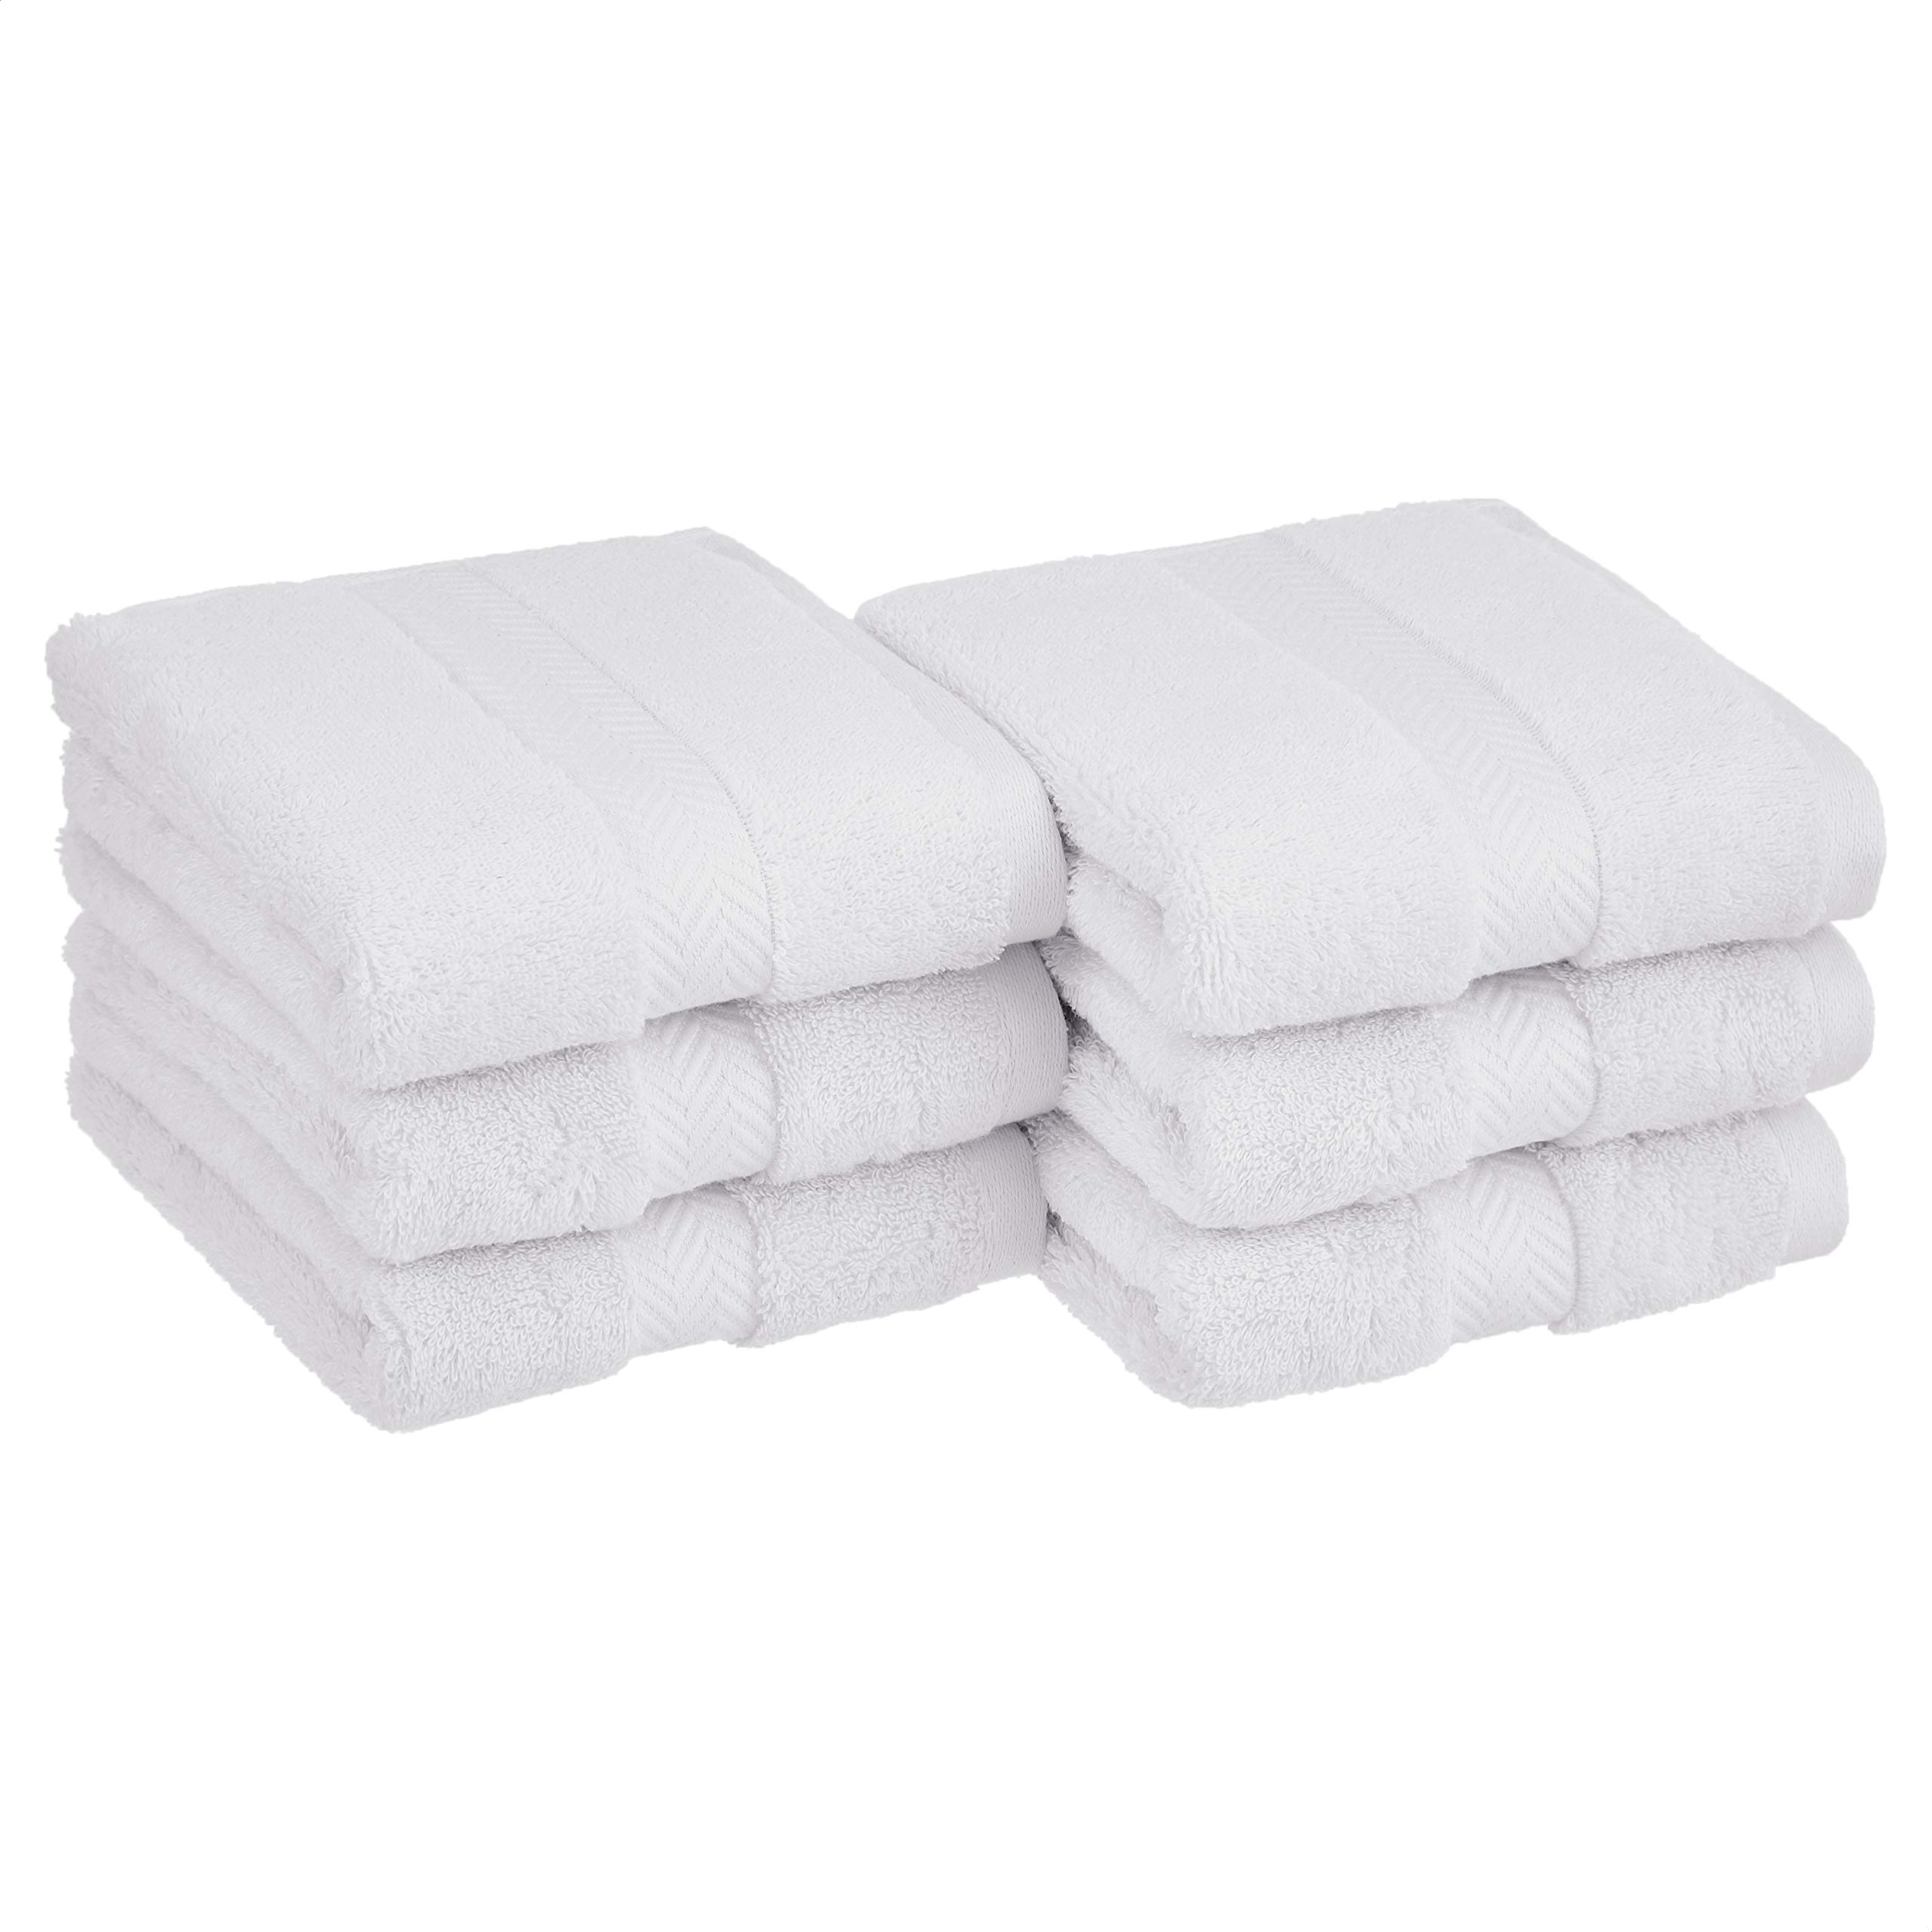 Amazon Basics Egyptian Cotton Hand Towel - 6-Pack, Pristine Snow